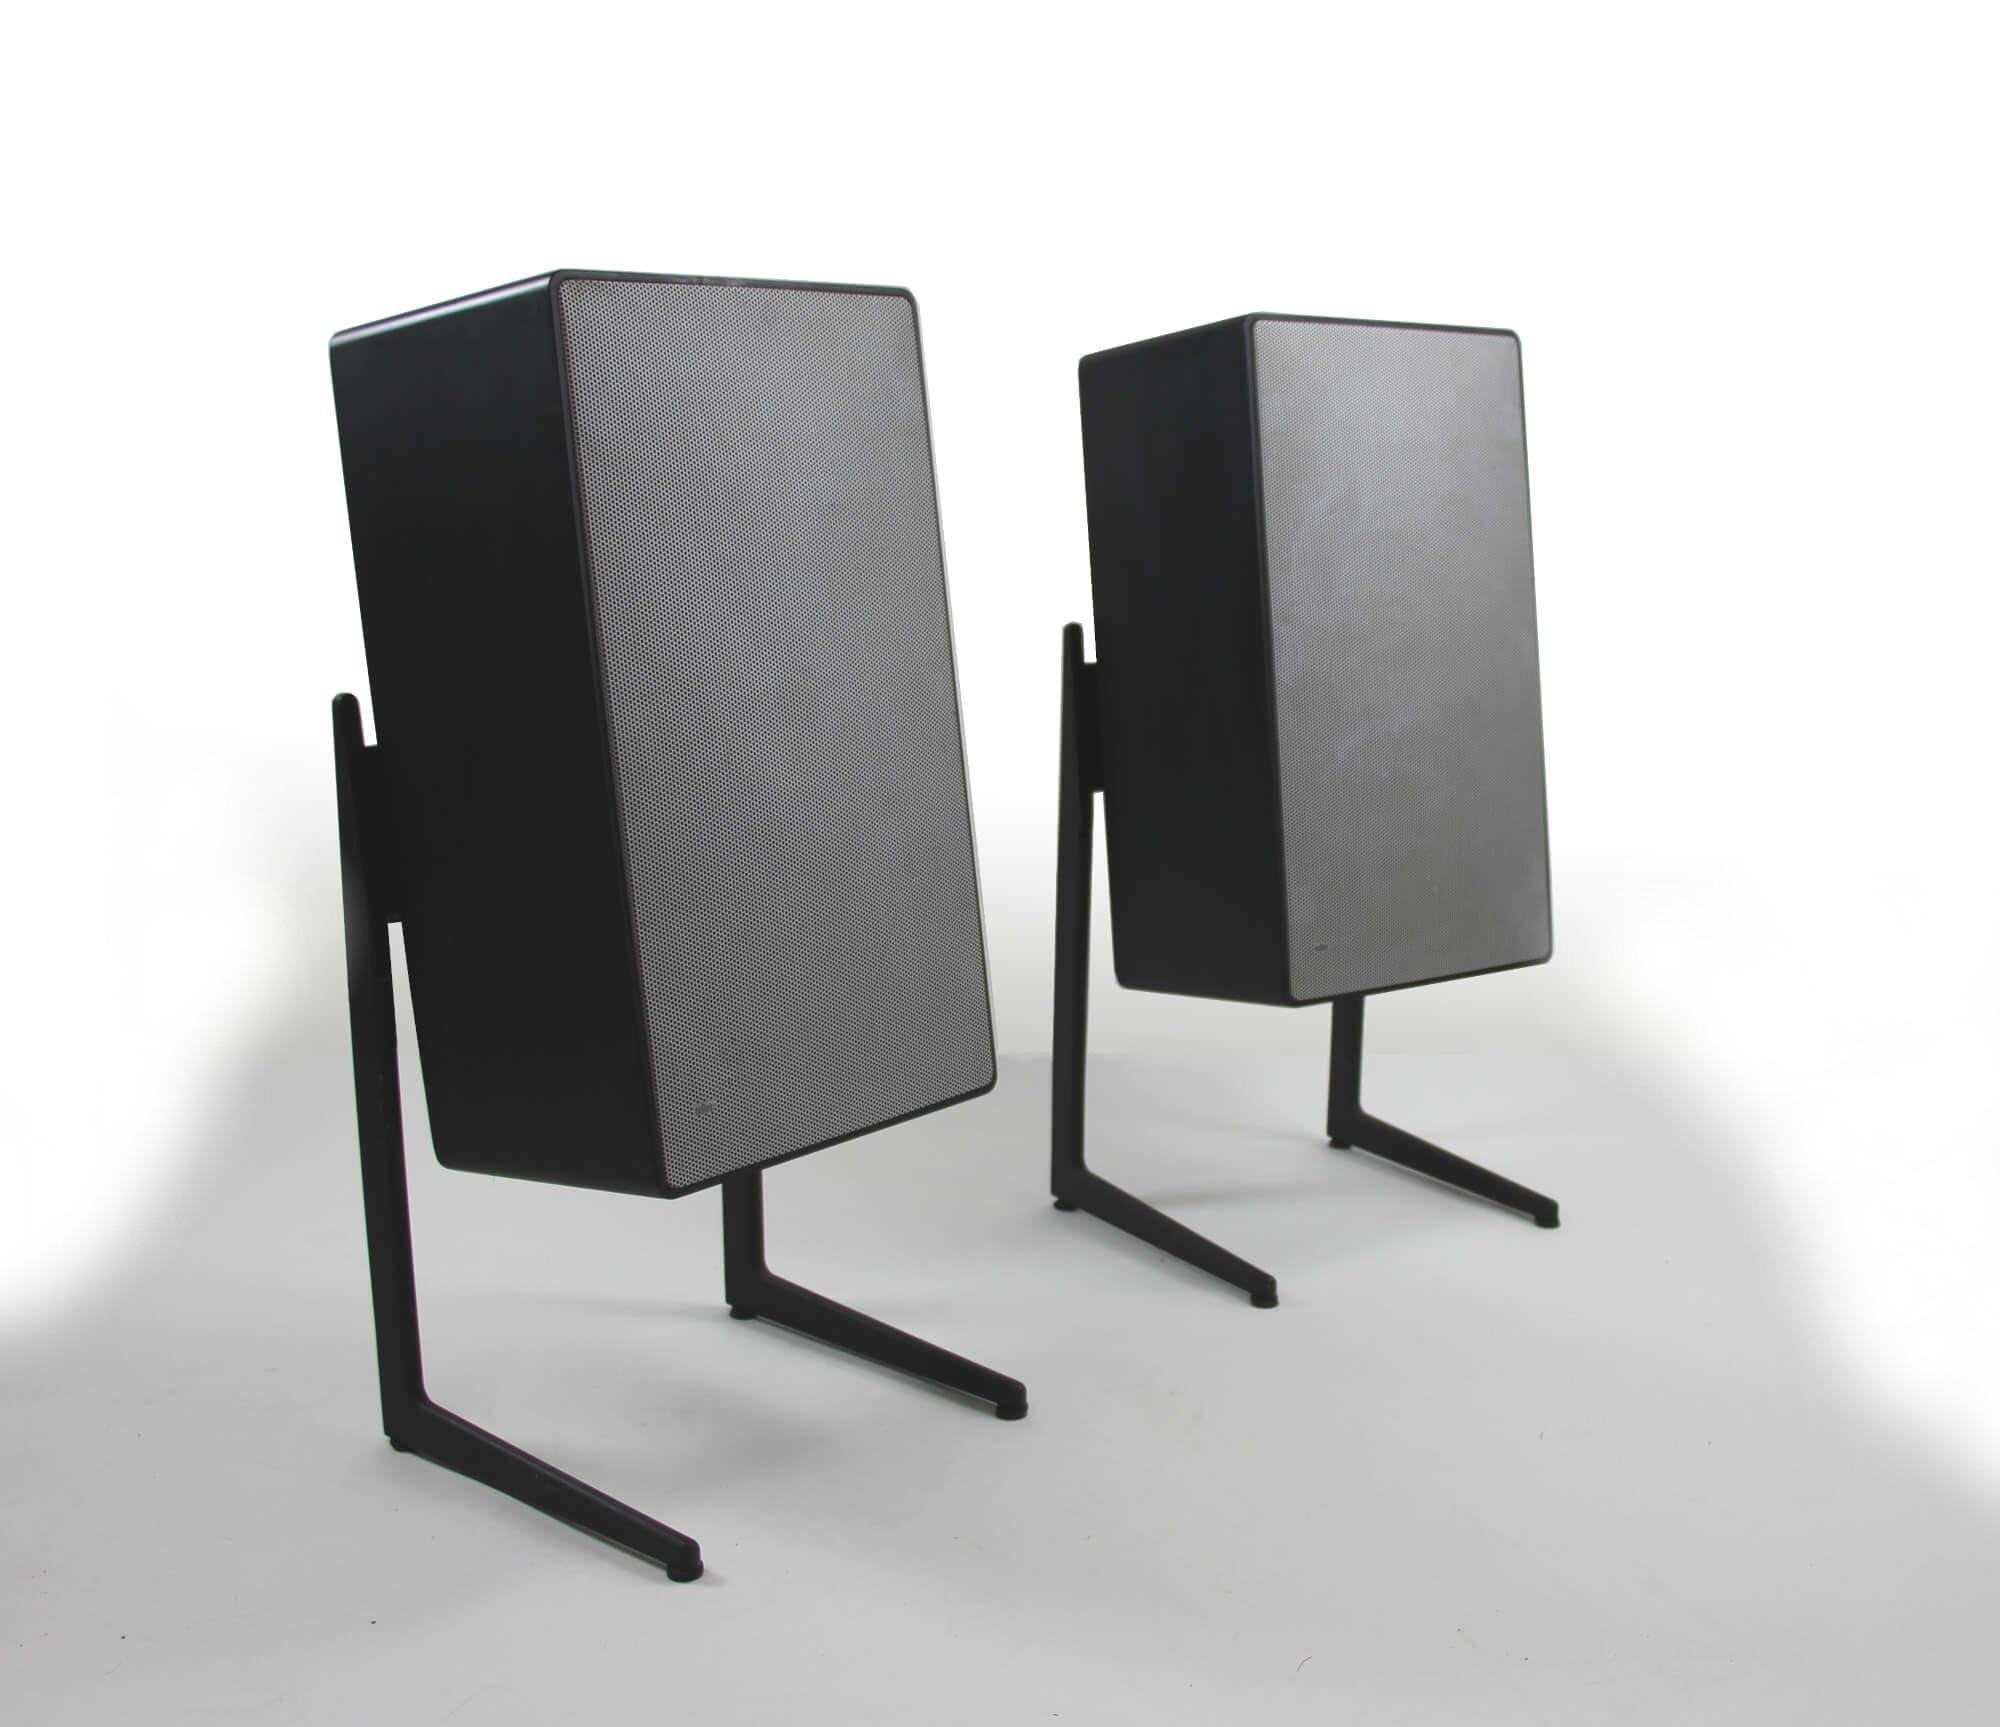 L 710 schwarz & LF 700